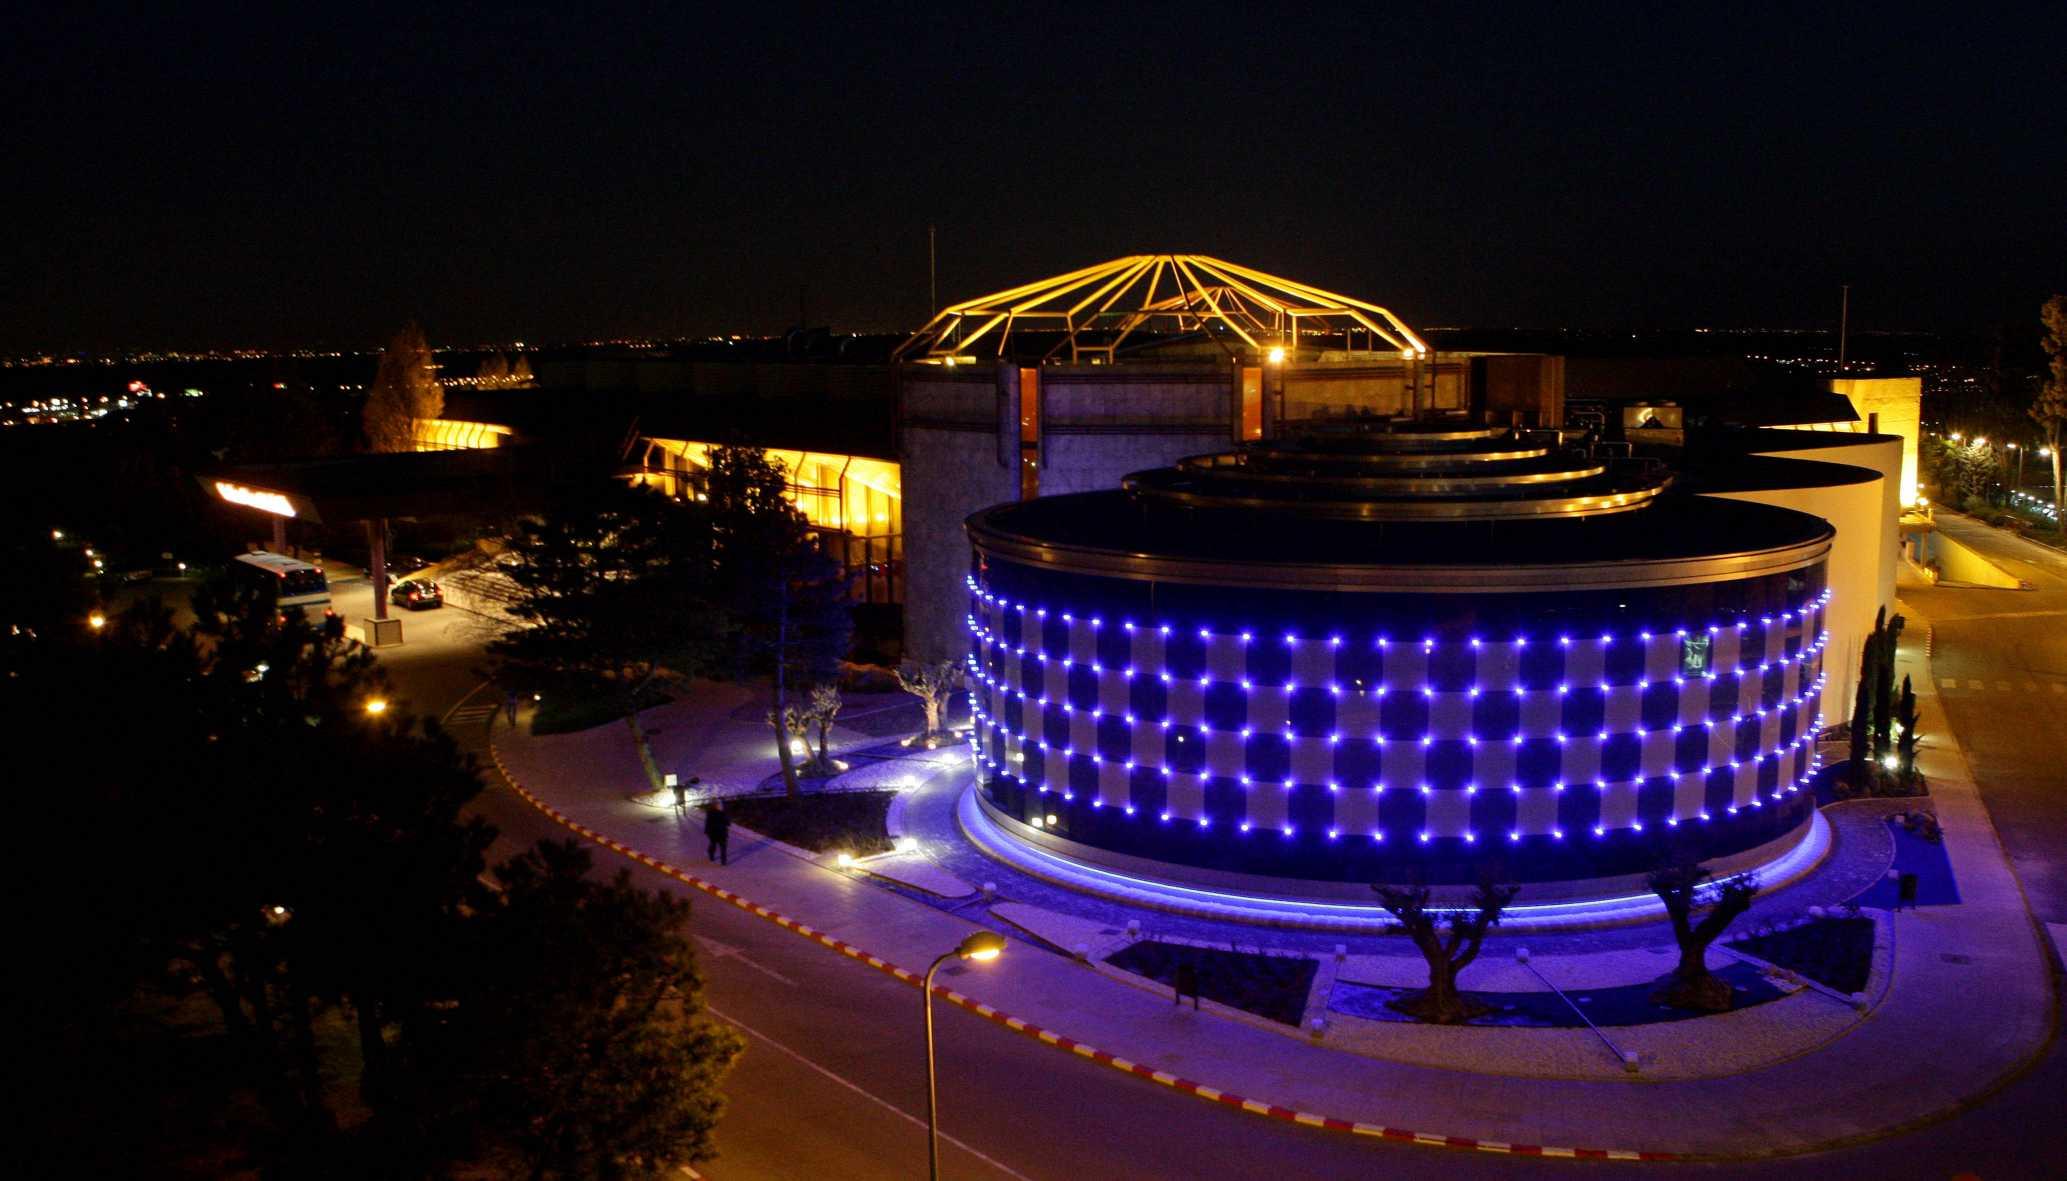 Casino madrid torrelodones poker sands hotel casino in bethlehem pa